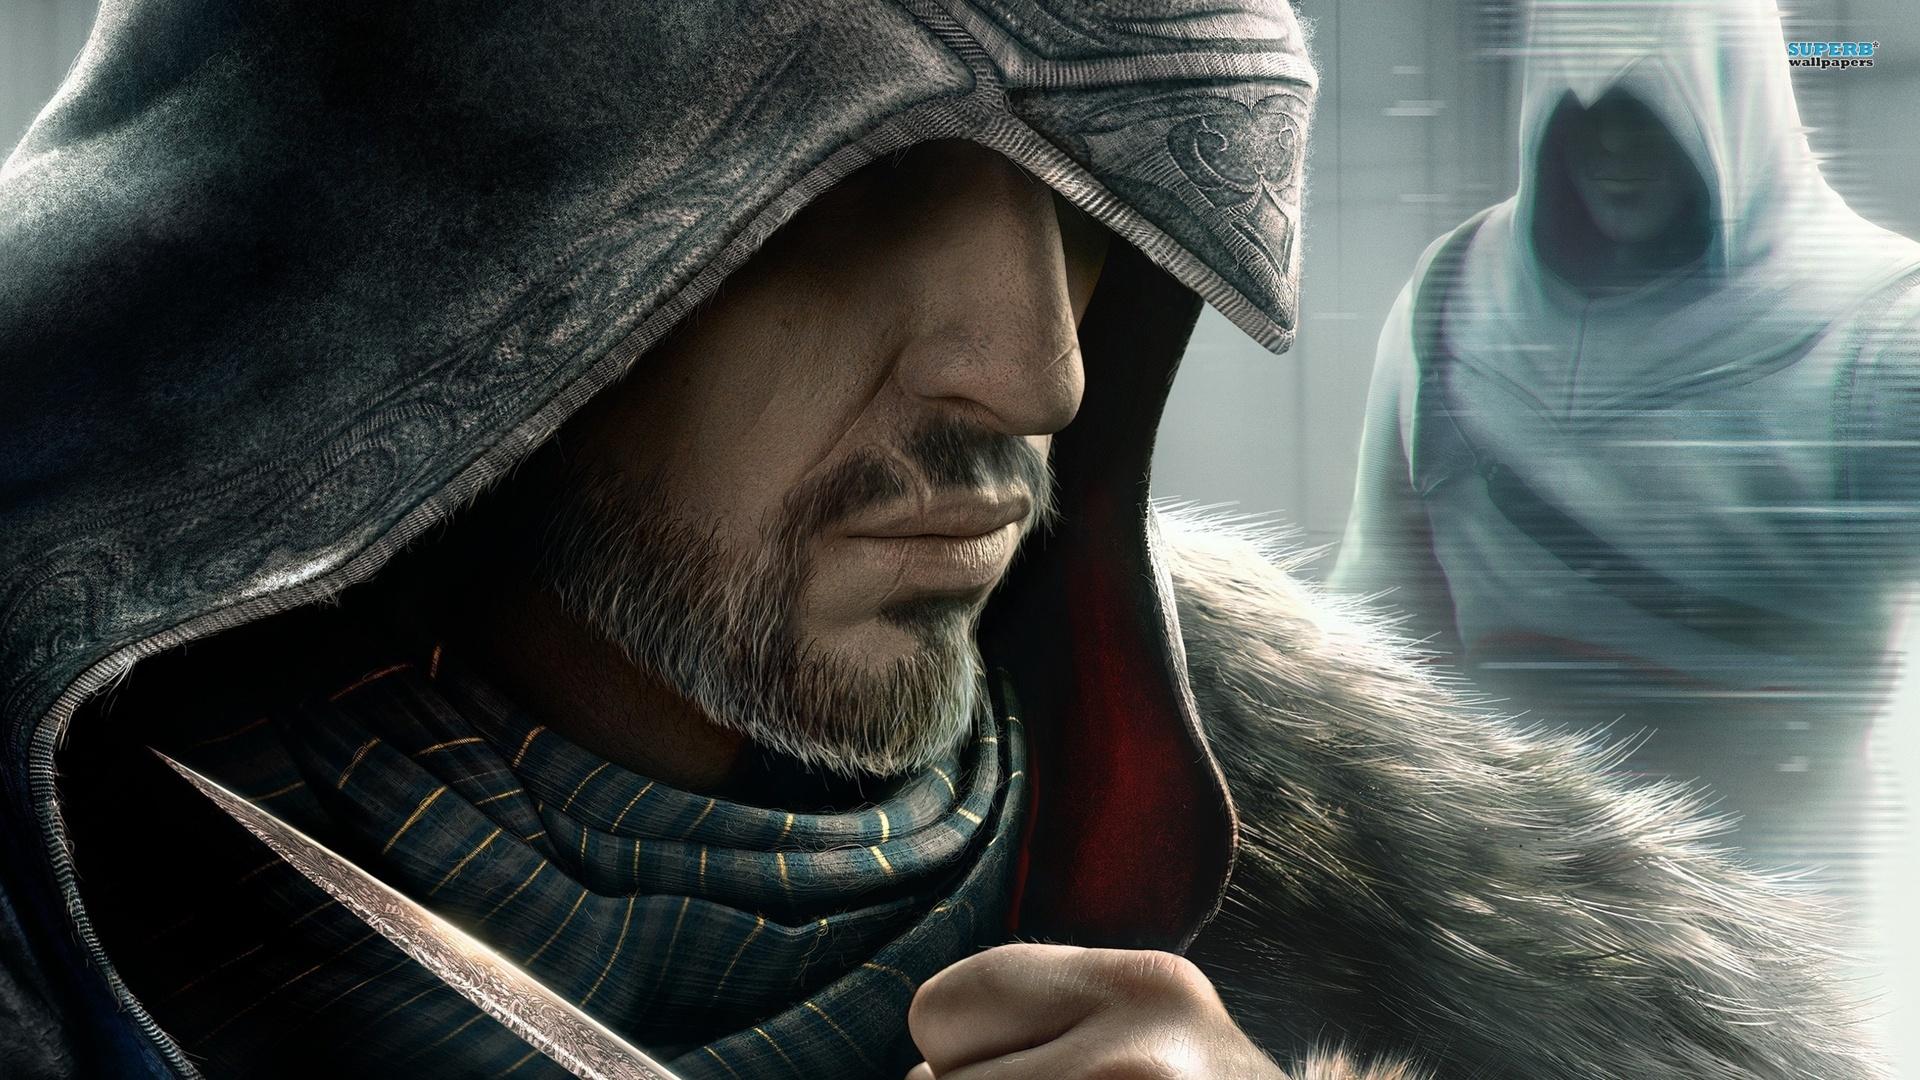 Assassins Creed Revelations full hd wallpapers 1080p Full HD 1920x1080